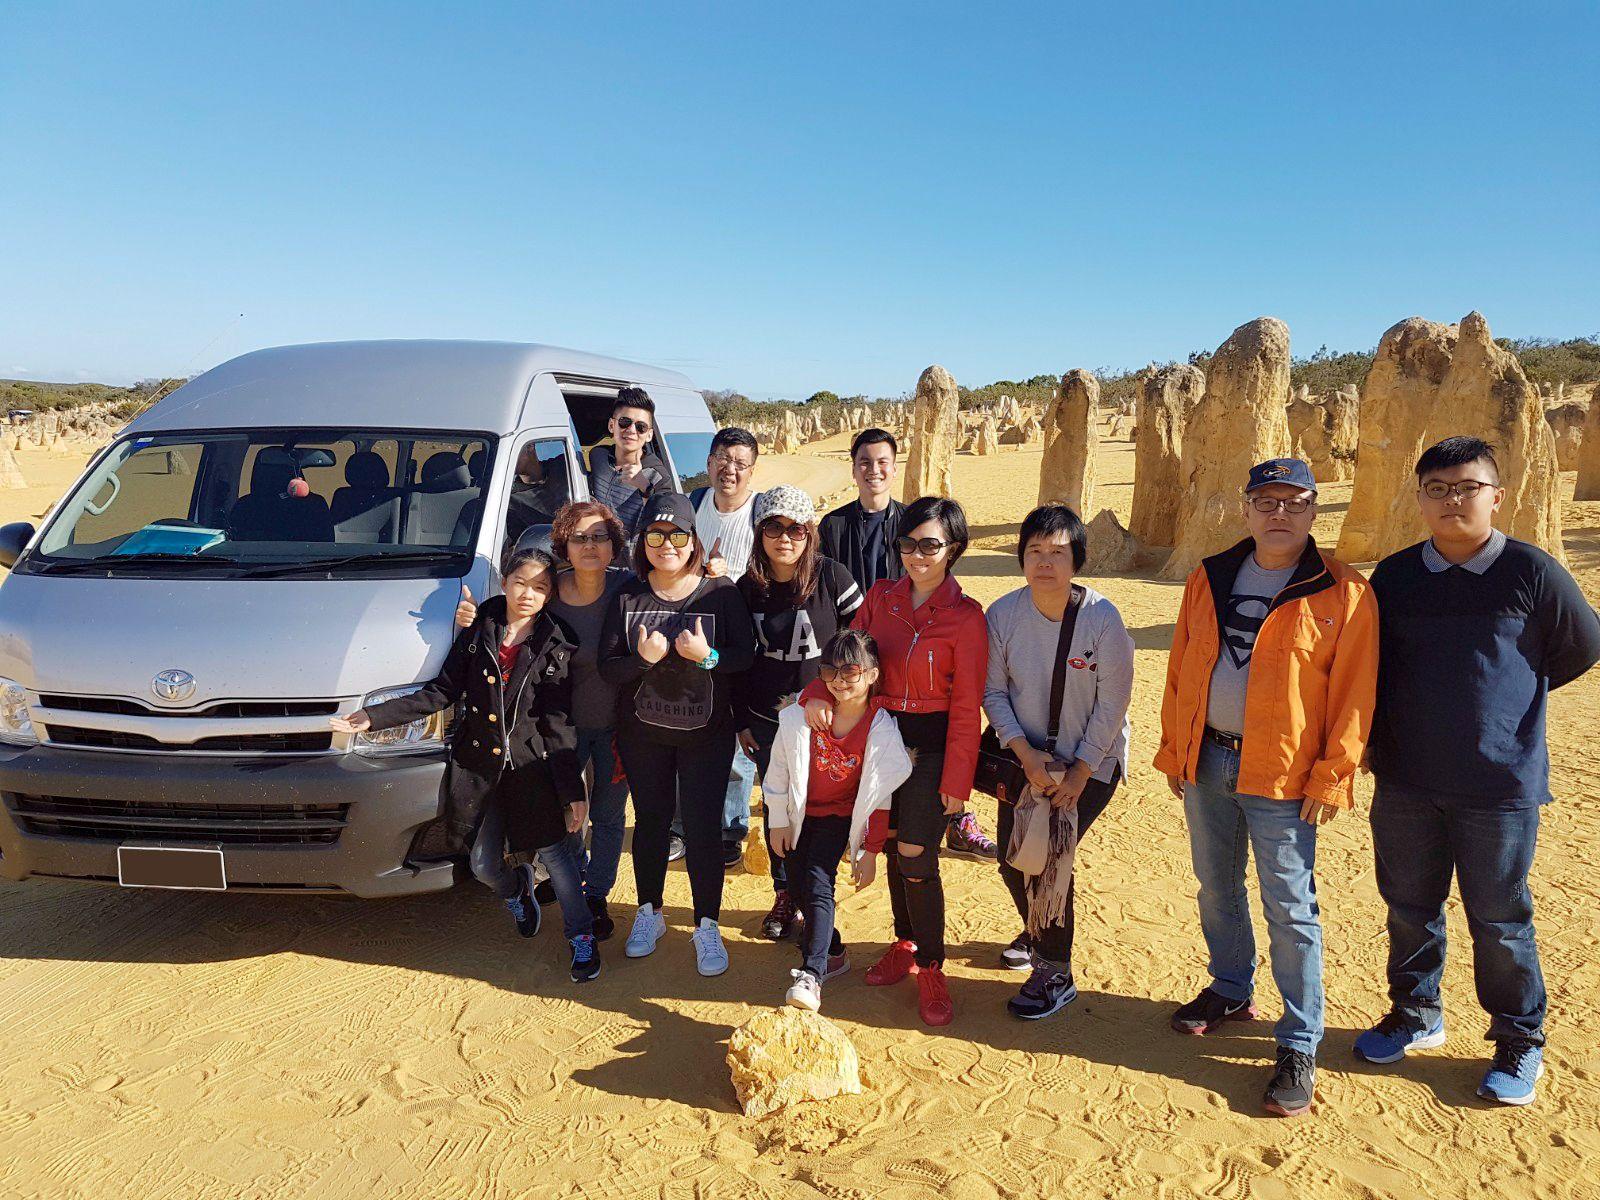 Yanchep, Lancelin sand dunes and Pinnacles private tour